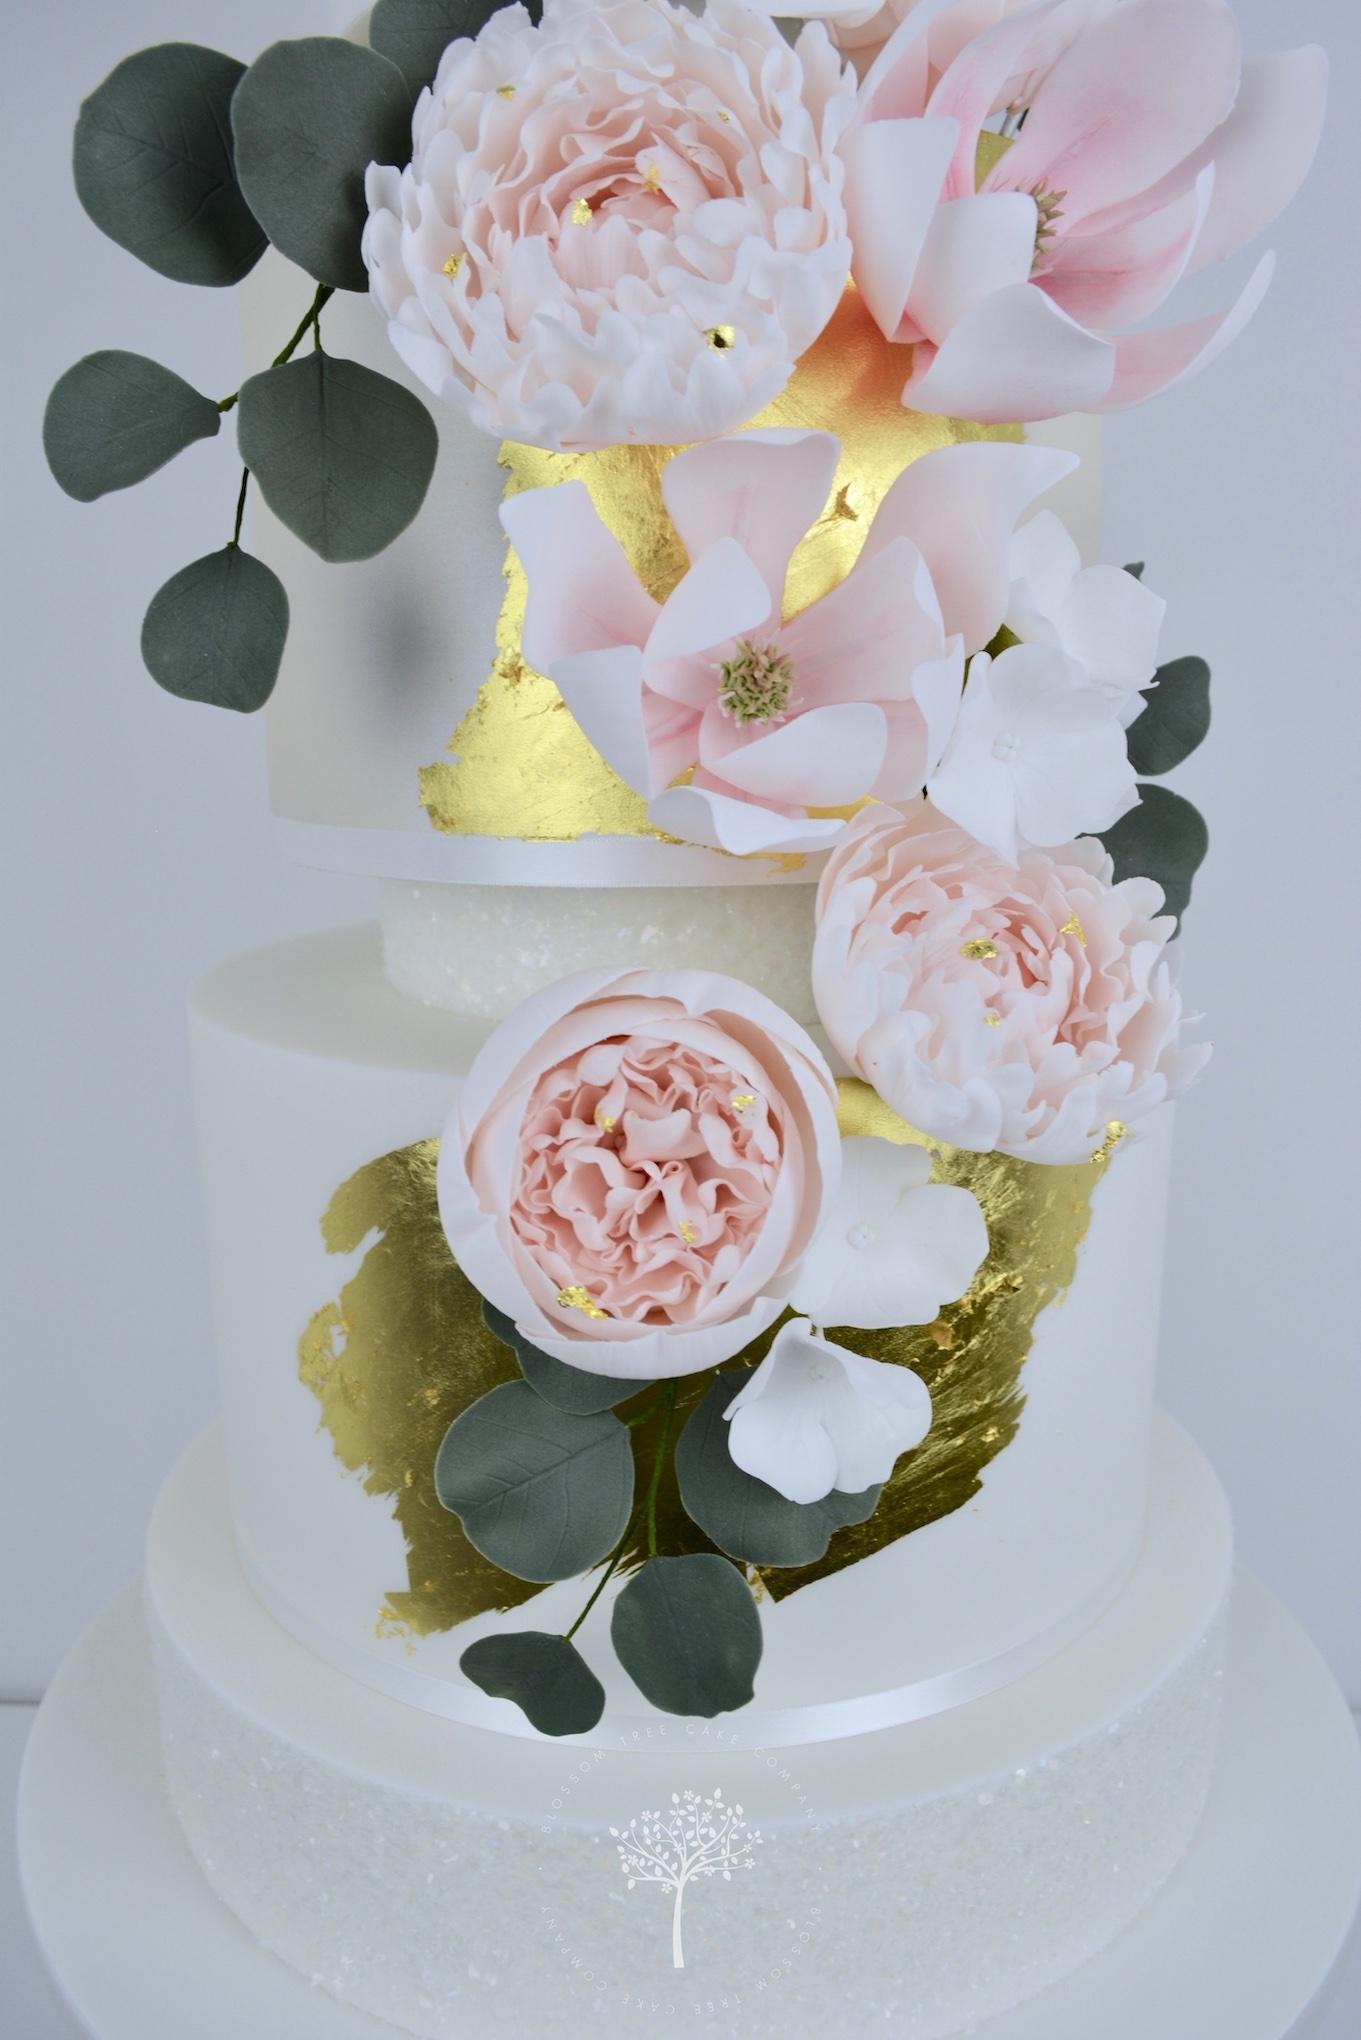 Peony and Magnolia Wedding Cake by Blossom Tree Cake Company Harrogate North Yorkshire - sugar peonies and magnolias.jpg